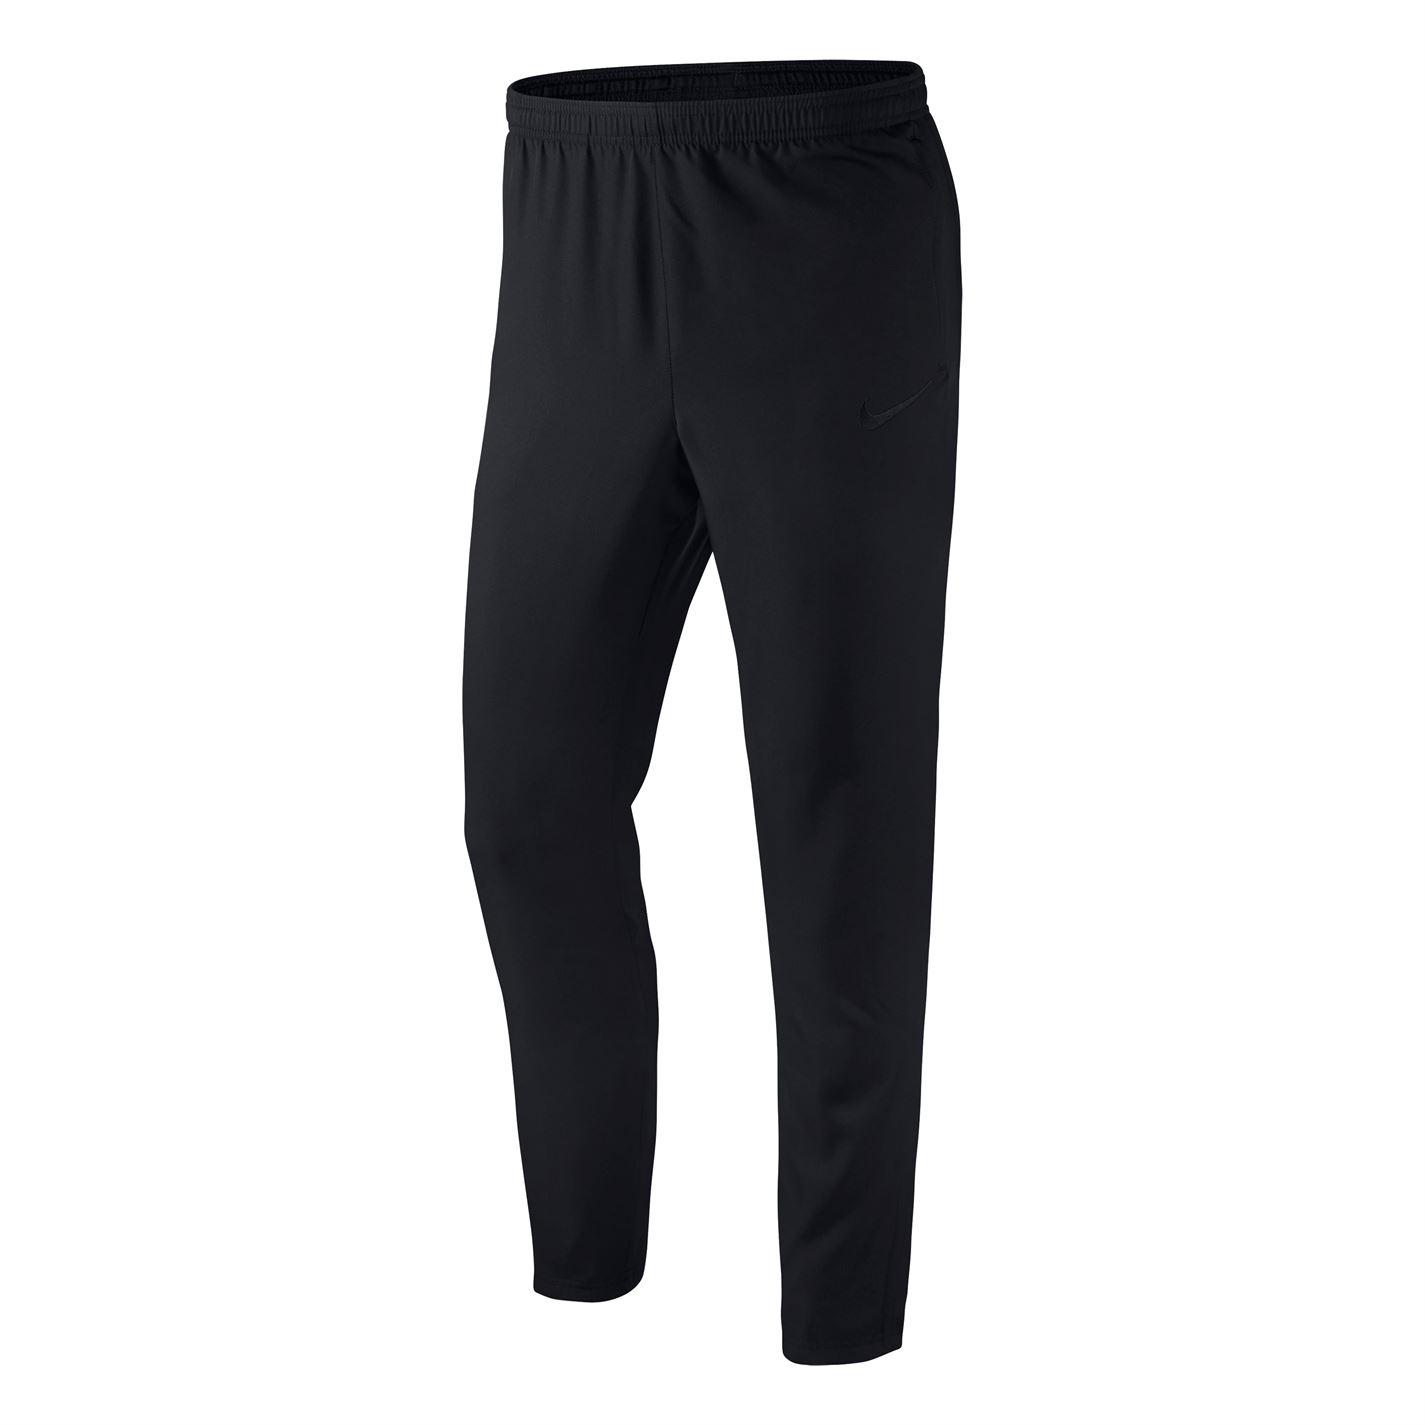 Nike Academy Tracksuit Bottoms Mens - Glami.hu 56e3810f05